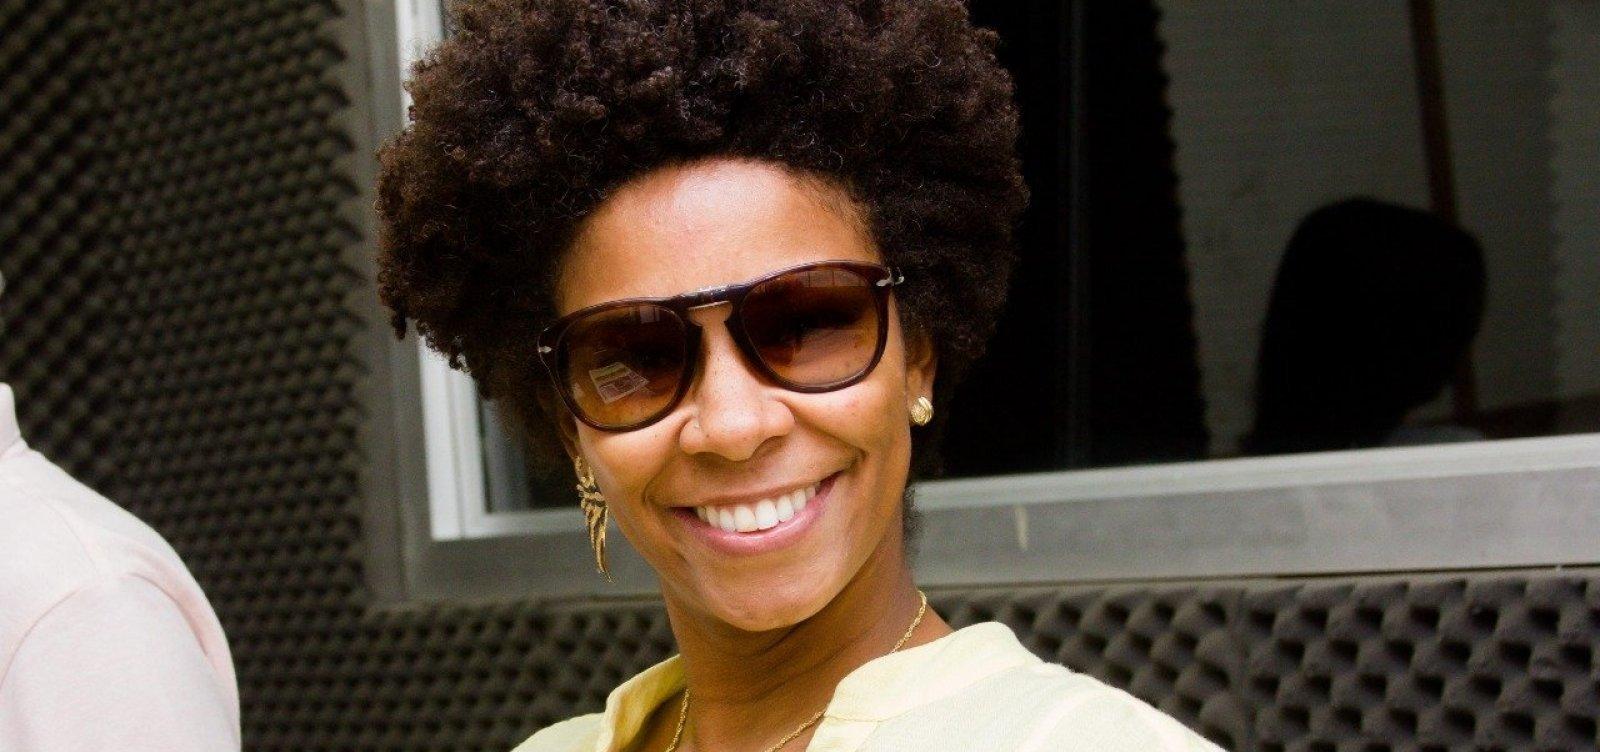 Programa Umbu, na Rádio Metropole, recebe Rita Batista nesta sexta-feira